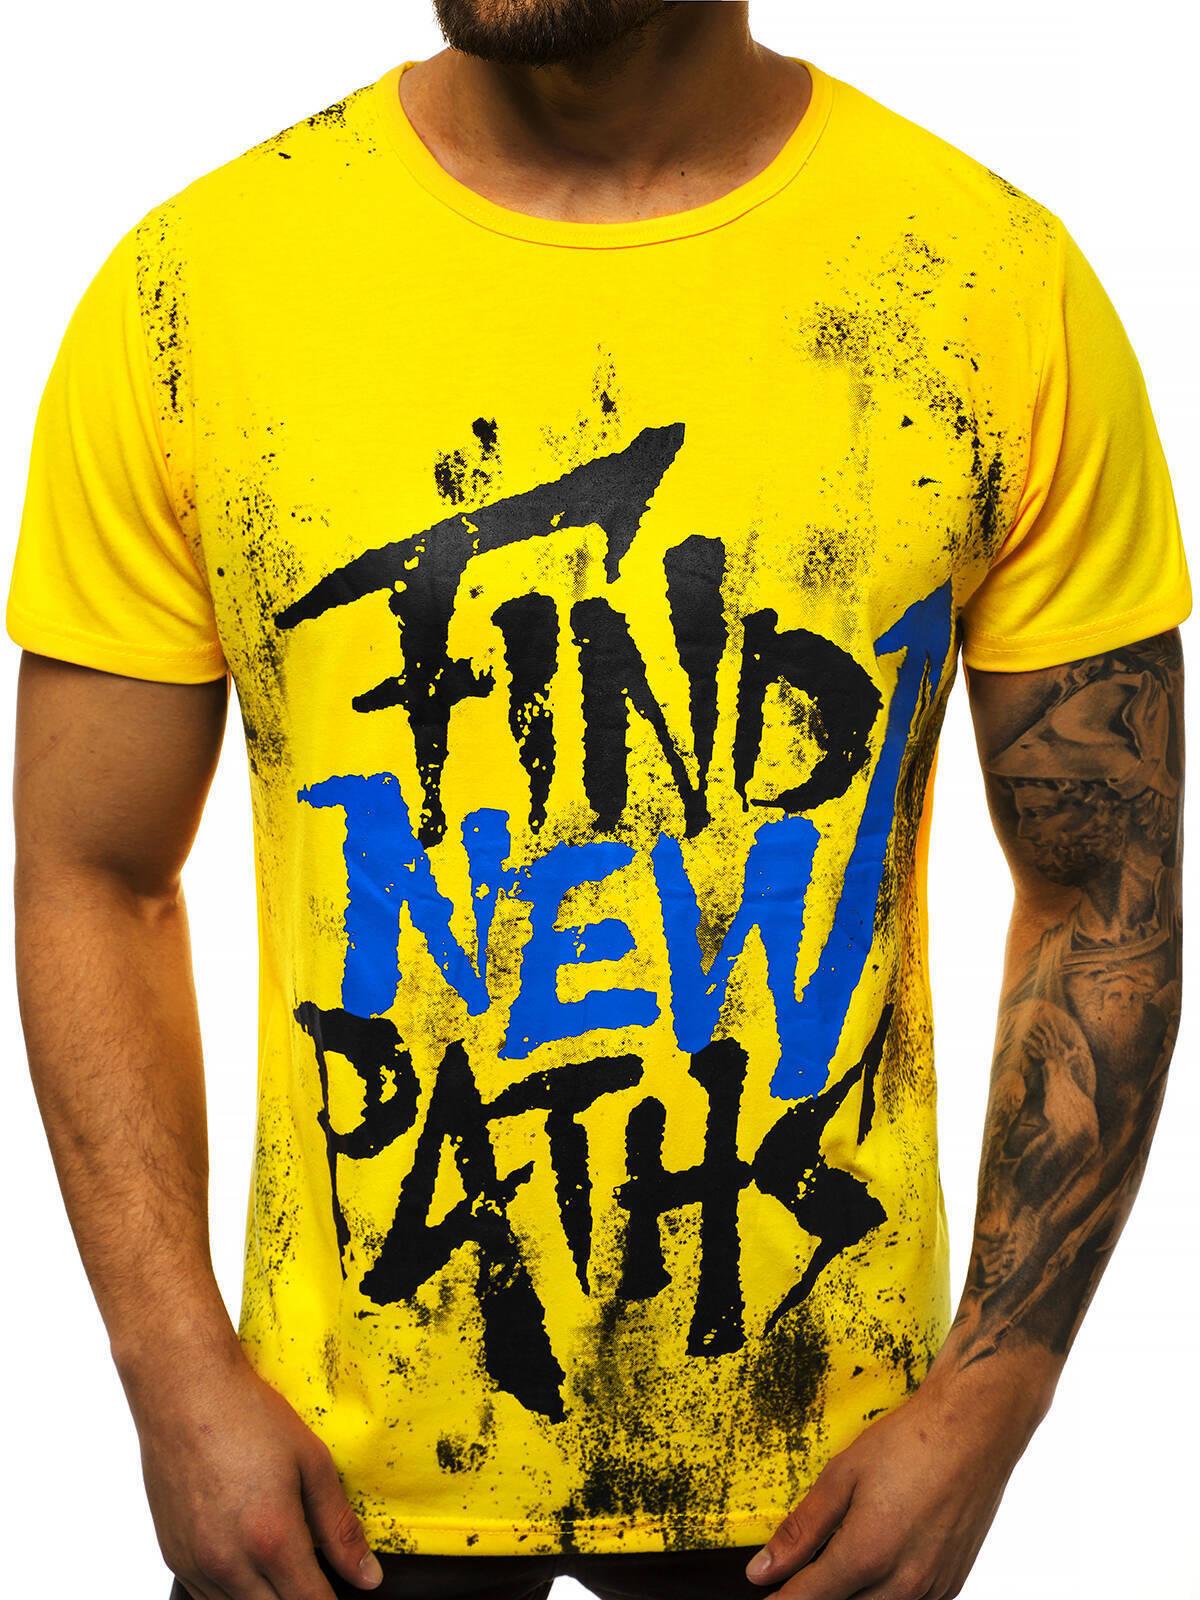 Indexbild 14 - T-Shirt Kurzarm Print Aufdruck Fitness Jogging Sport Shirt Herren OZONEE 12511